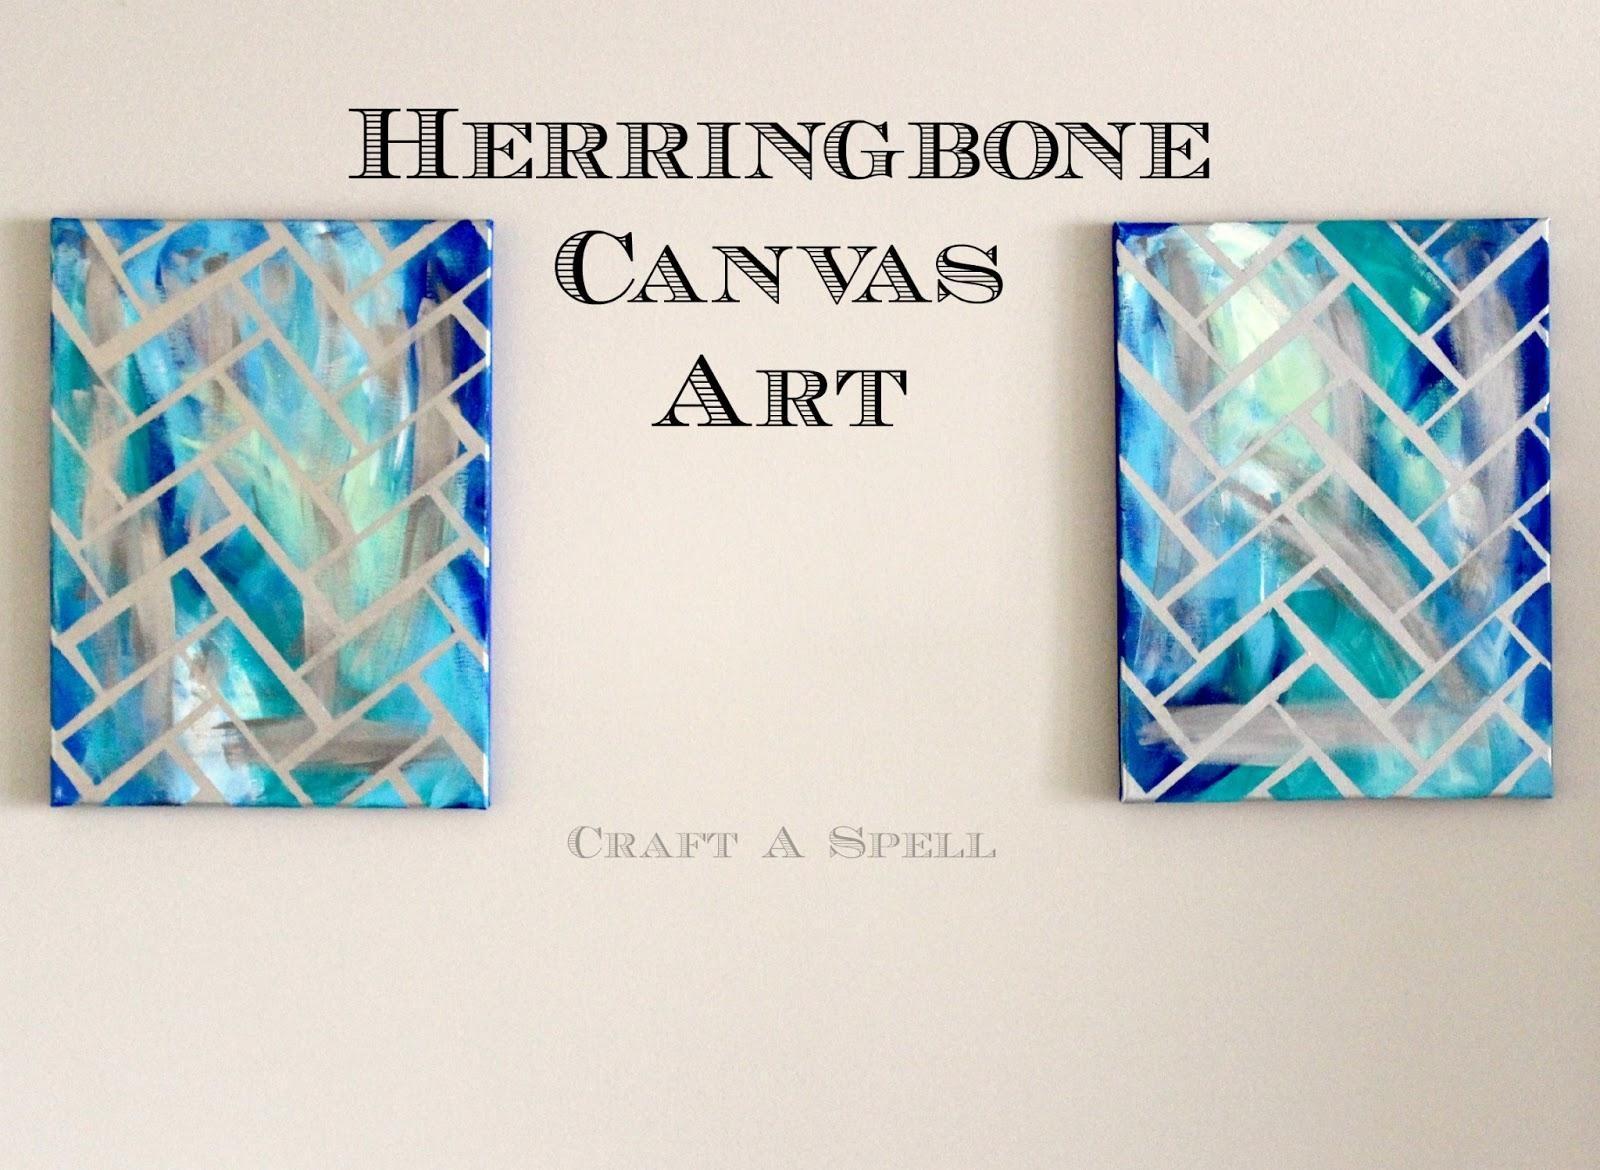 Craft A Spell: Diy Herringbone Canvas Art For Diy Pinterest Canvas Art (Image 19 of 20)